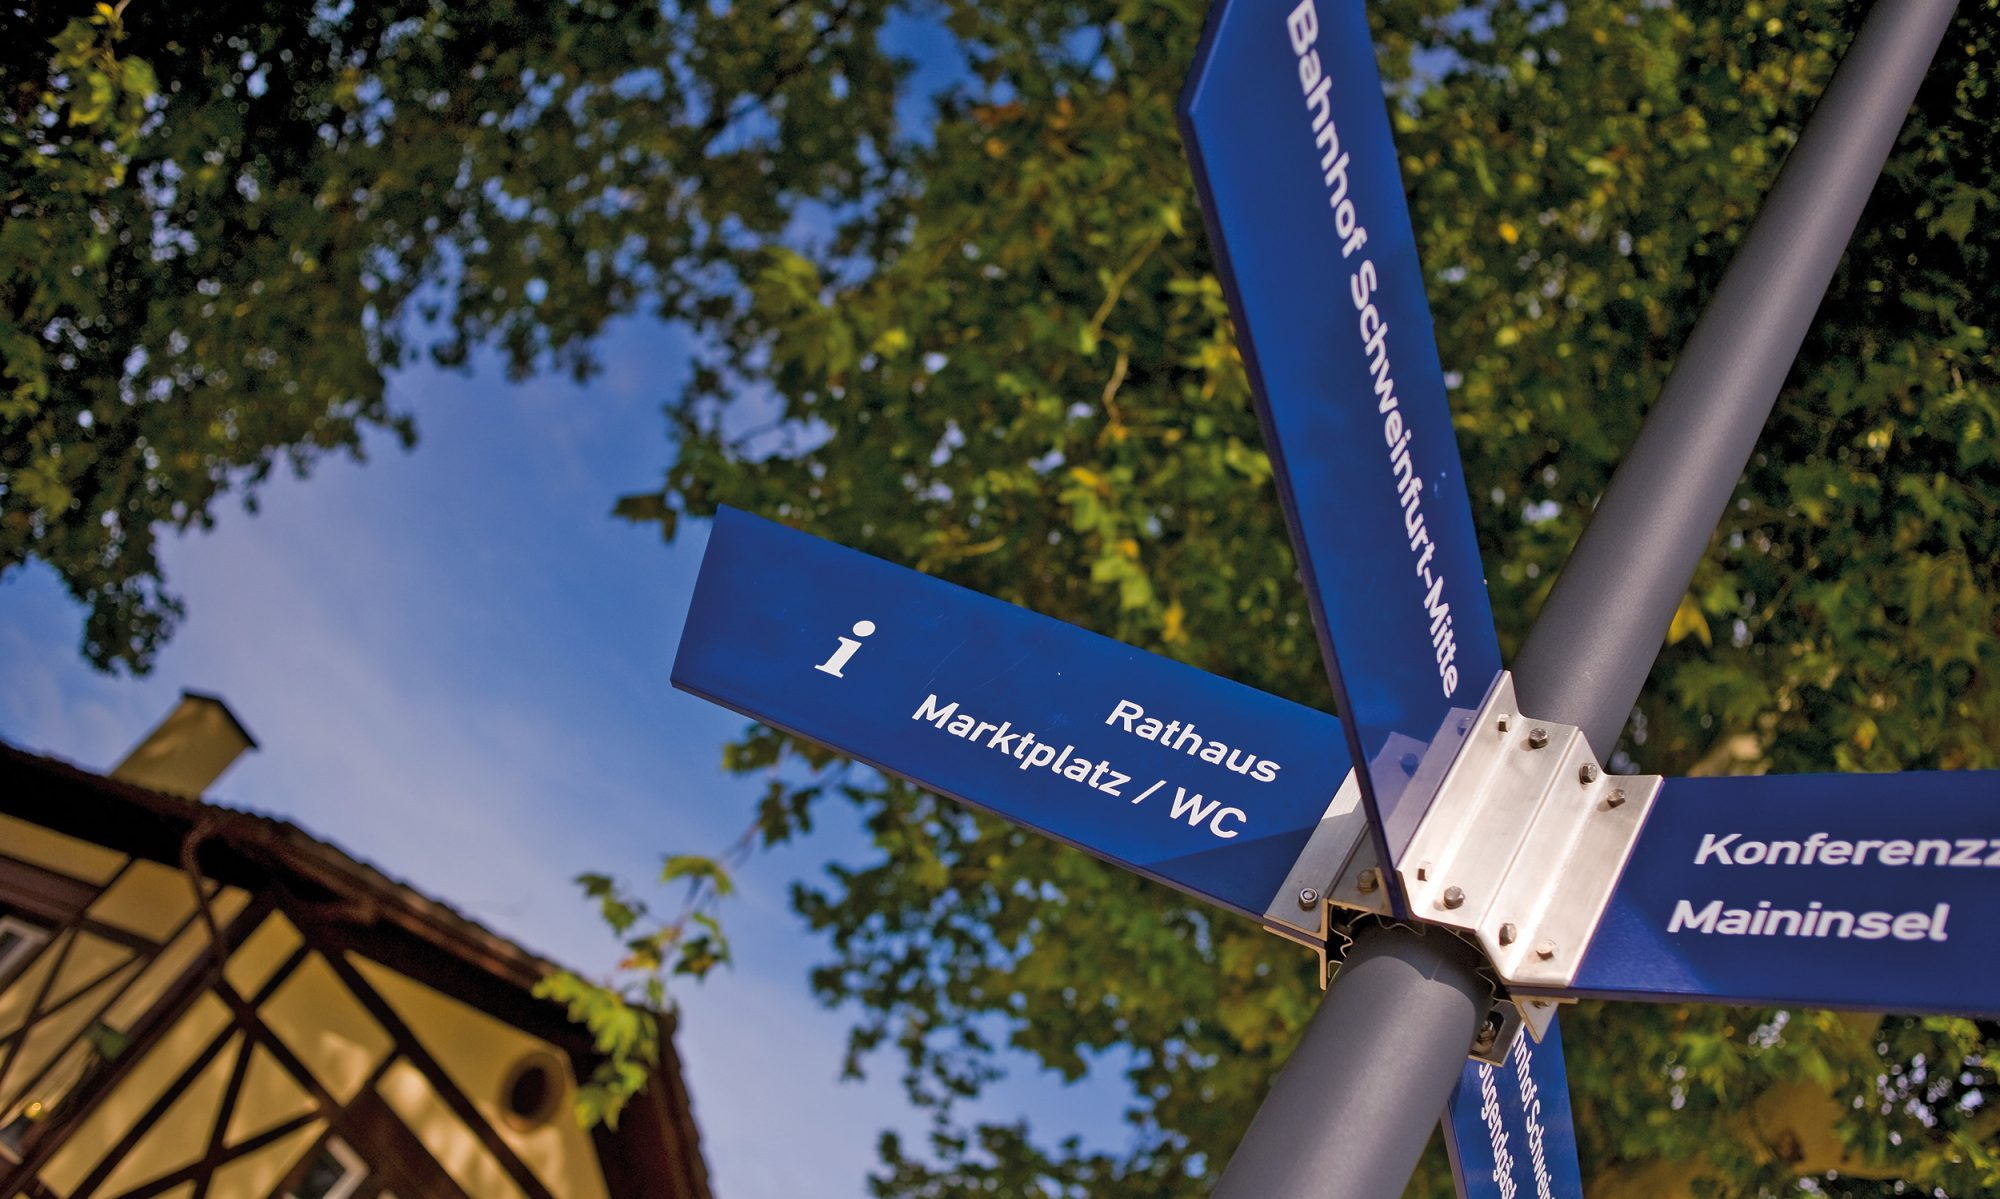 proschweinfurt.de